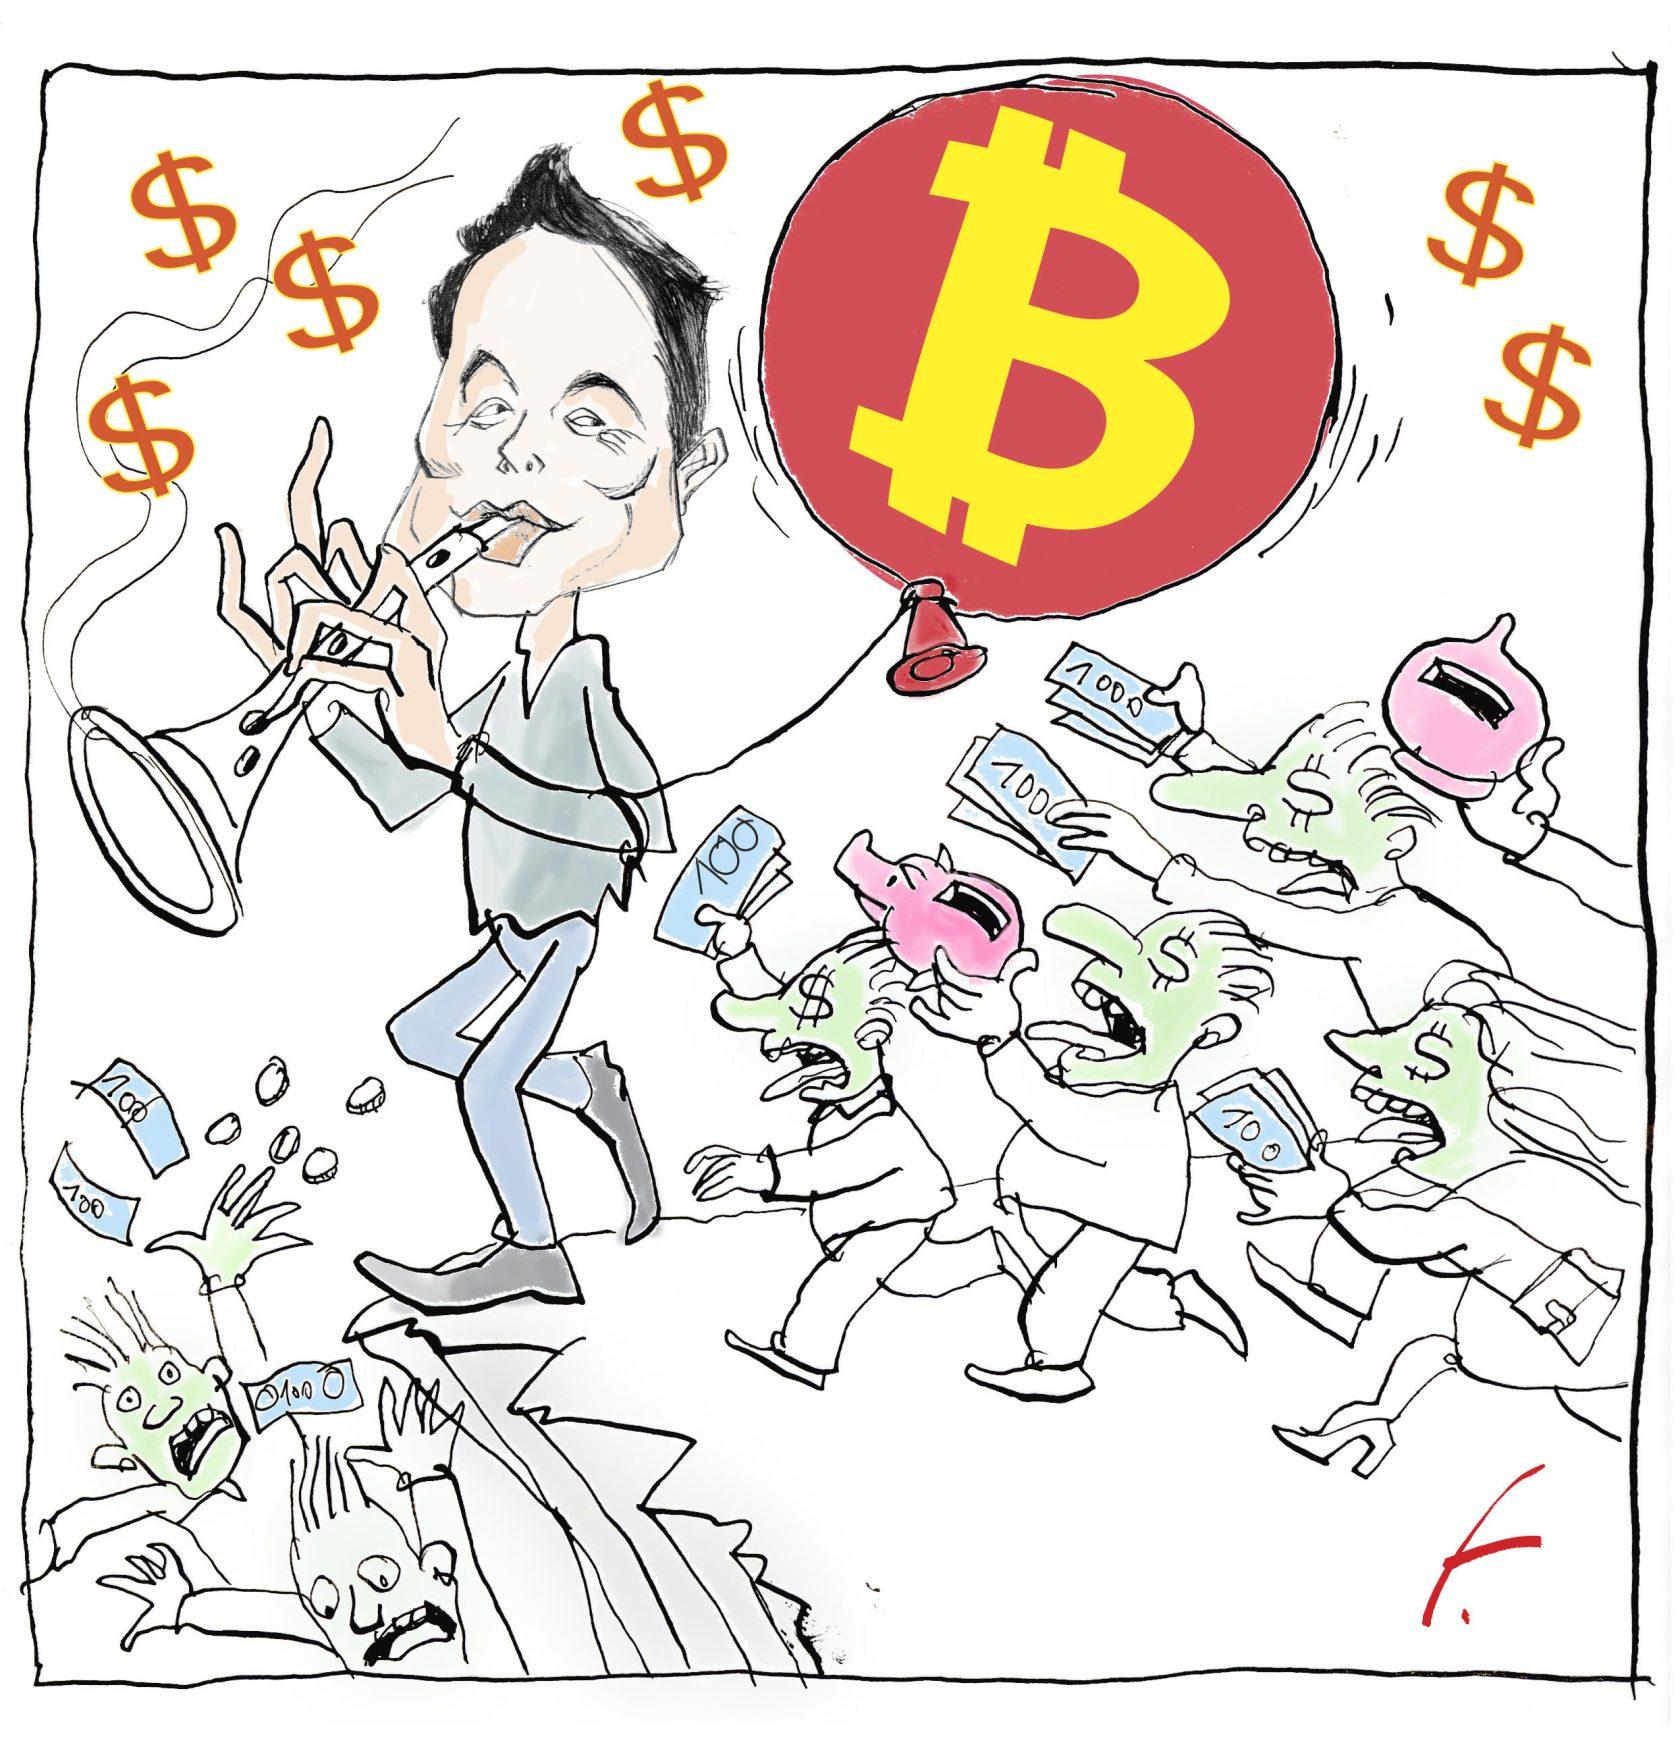 Mr. Tesla compra i Bitcoin